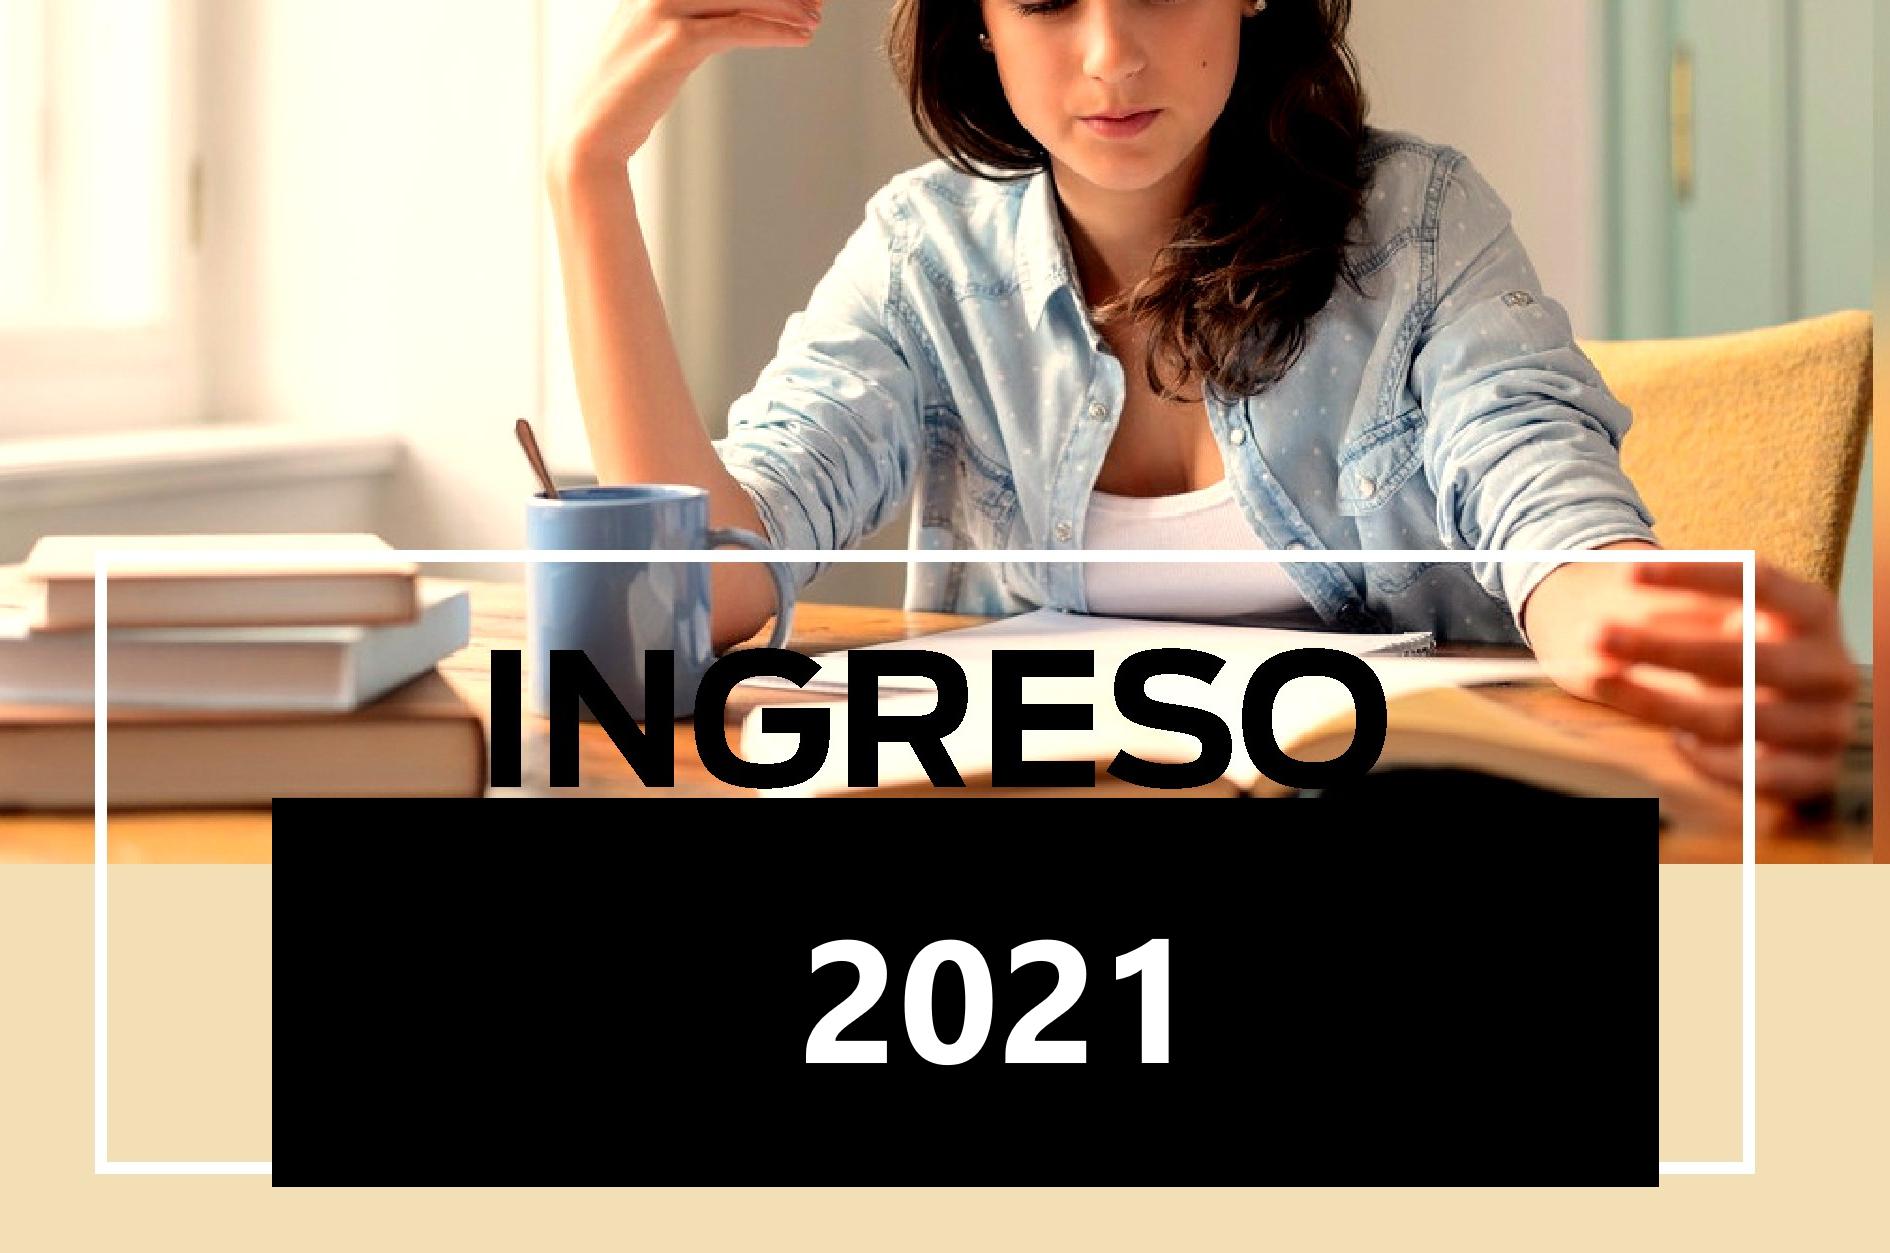 INGRESO 2021, 2° CUATRIMESTRE